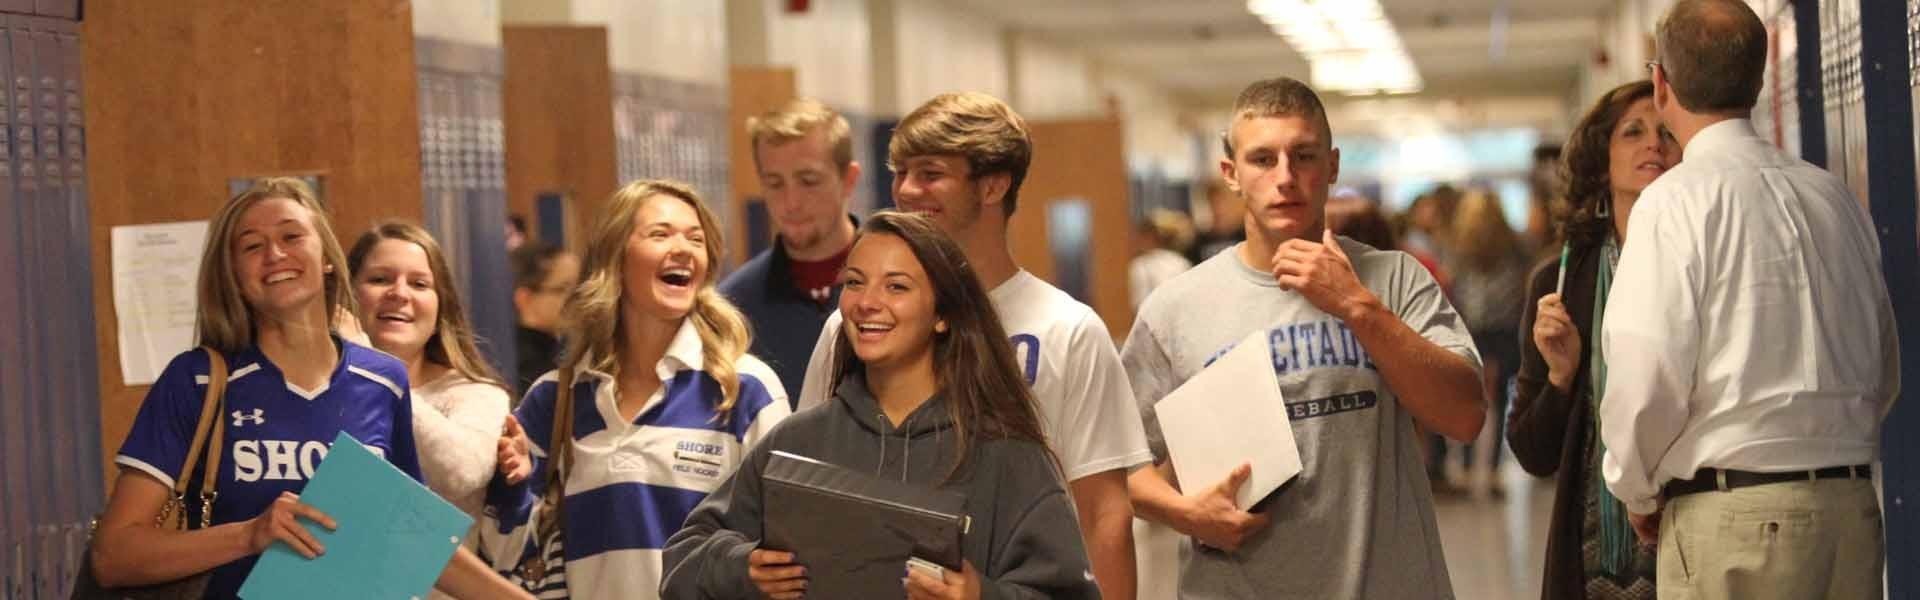 Shore Regional High School New Jersey USA Students 2019